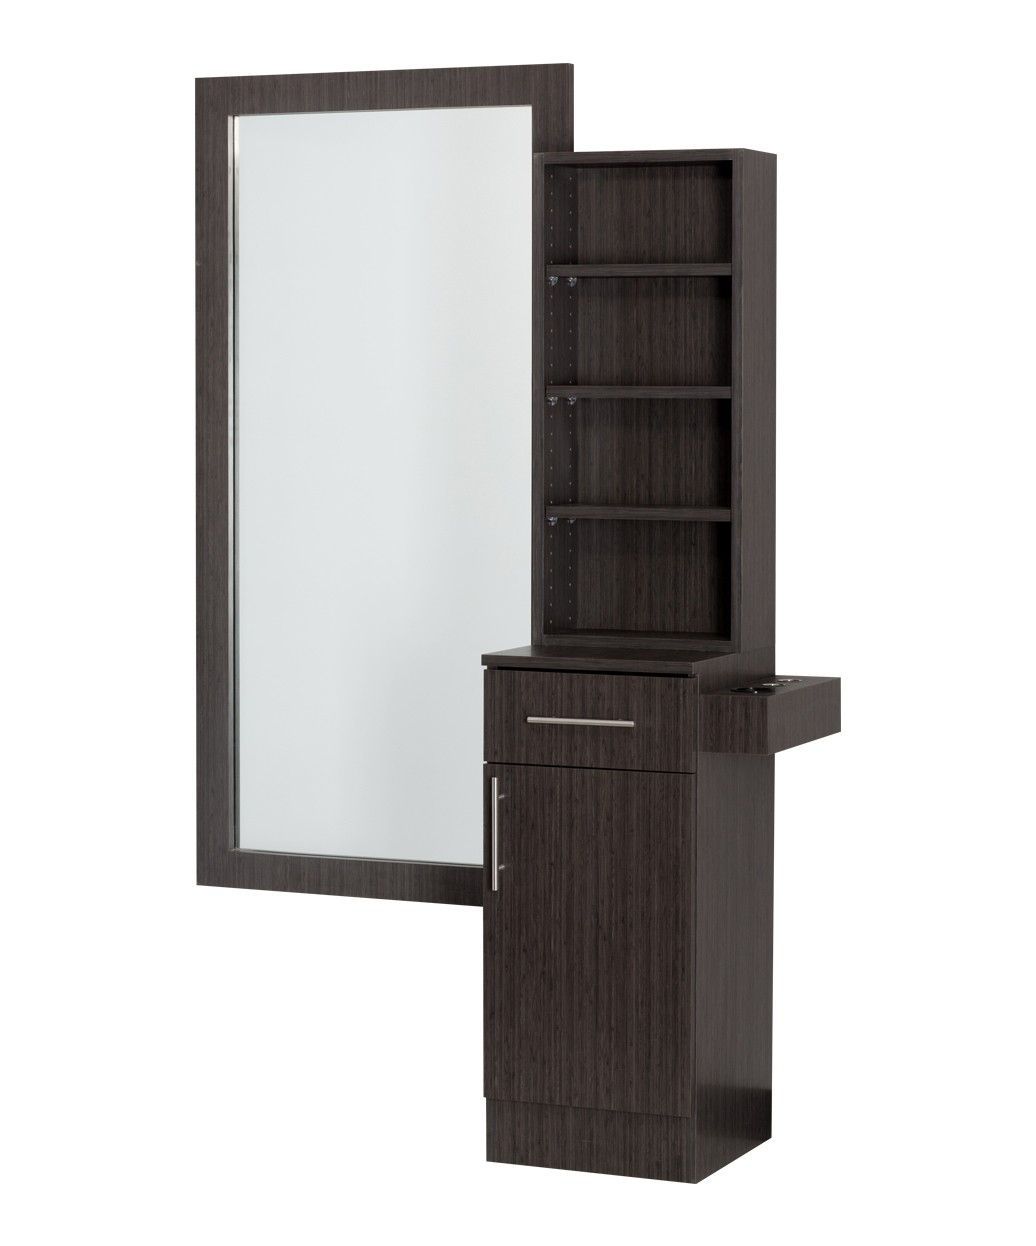 corner sofa bed dublin brand in malaysia black beauty salon hair styling station cabinet | cabinets ...